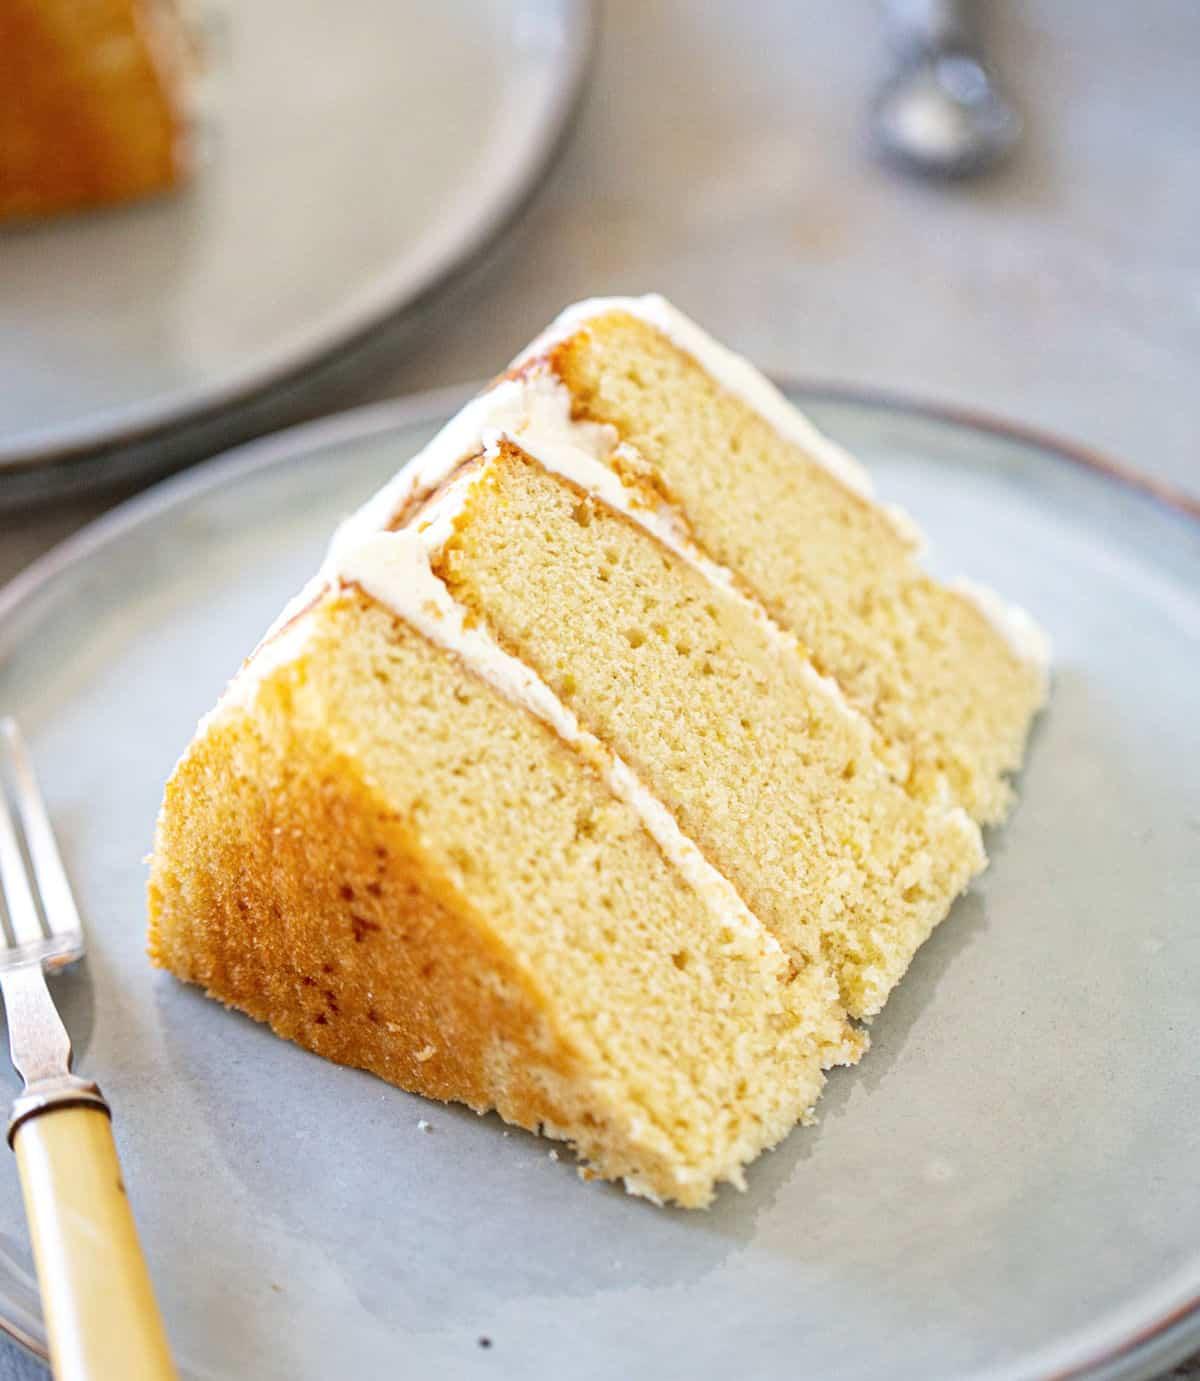 Close of slice of three layer lemon cream cake on grey plates and background